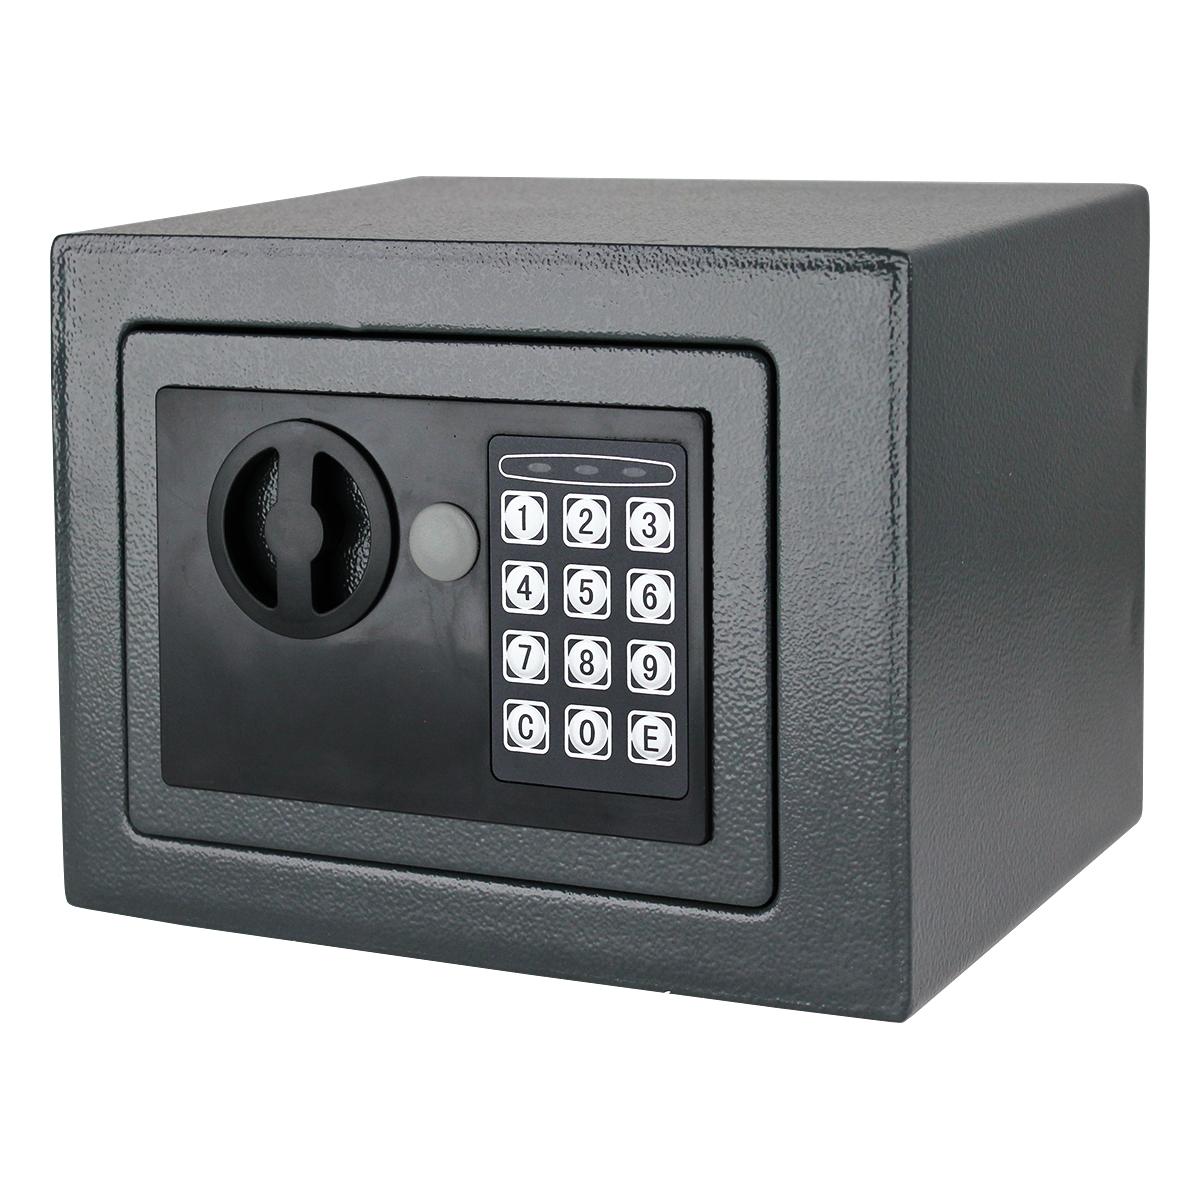 digital electronic small safe box keypad lock home wall cabinet office hotel gun ebay. Black Bedroom Furniture Sets. Home Design Ideas